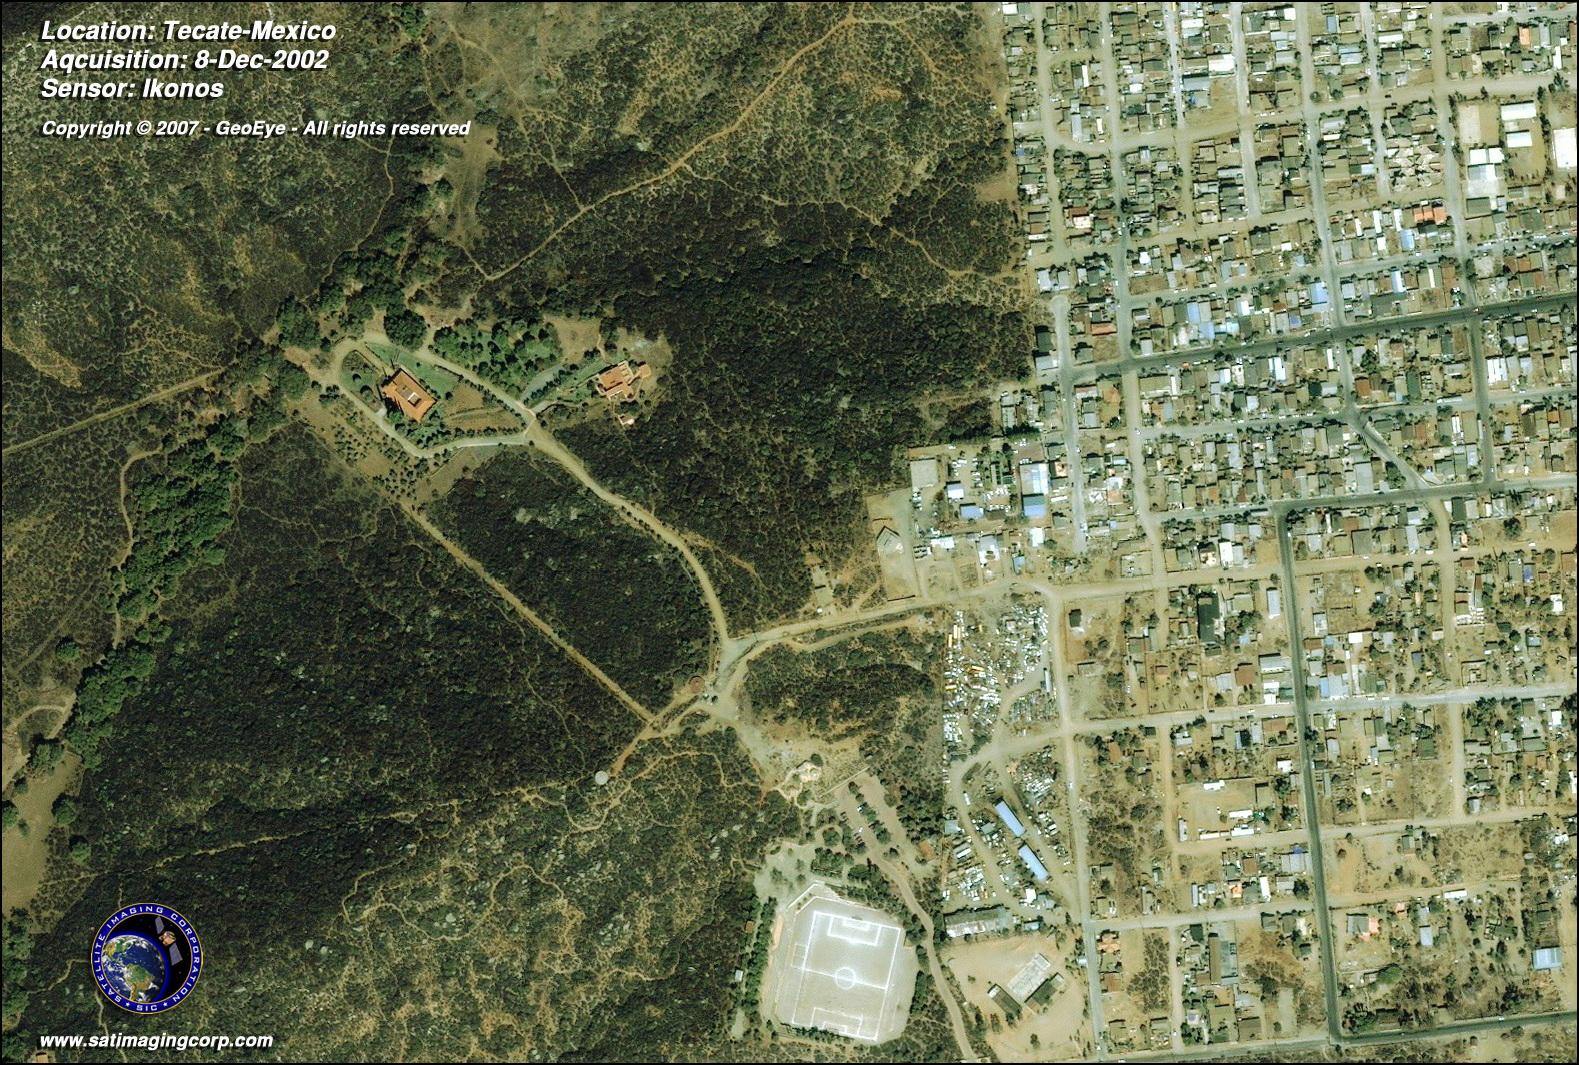 IKONOS Satellite Image of Tecate, Mexico   Satellite ...